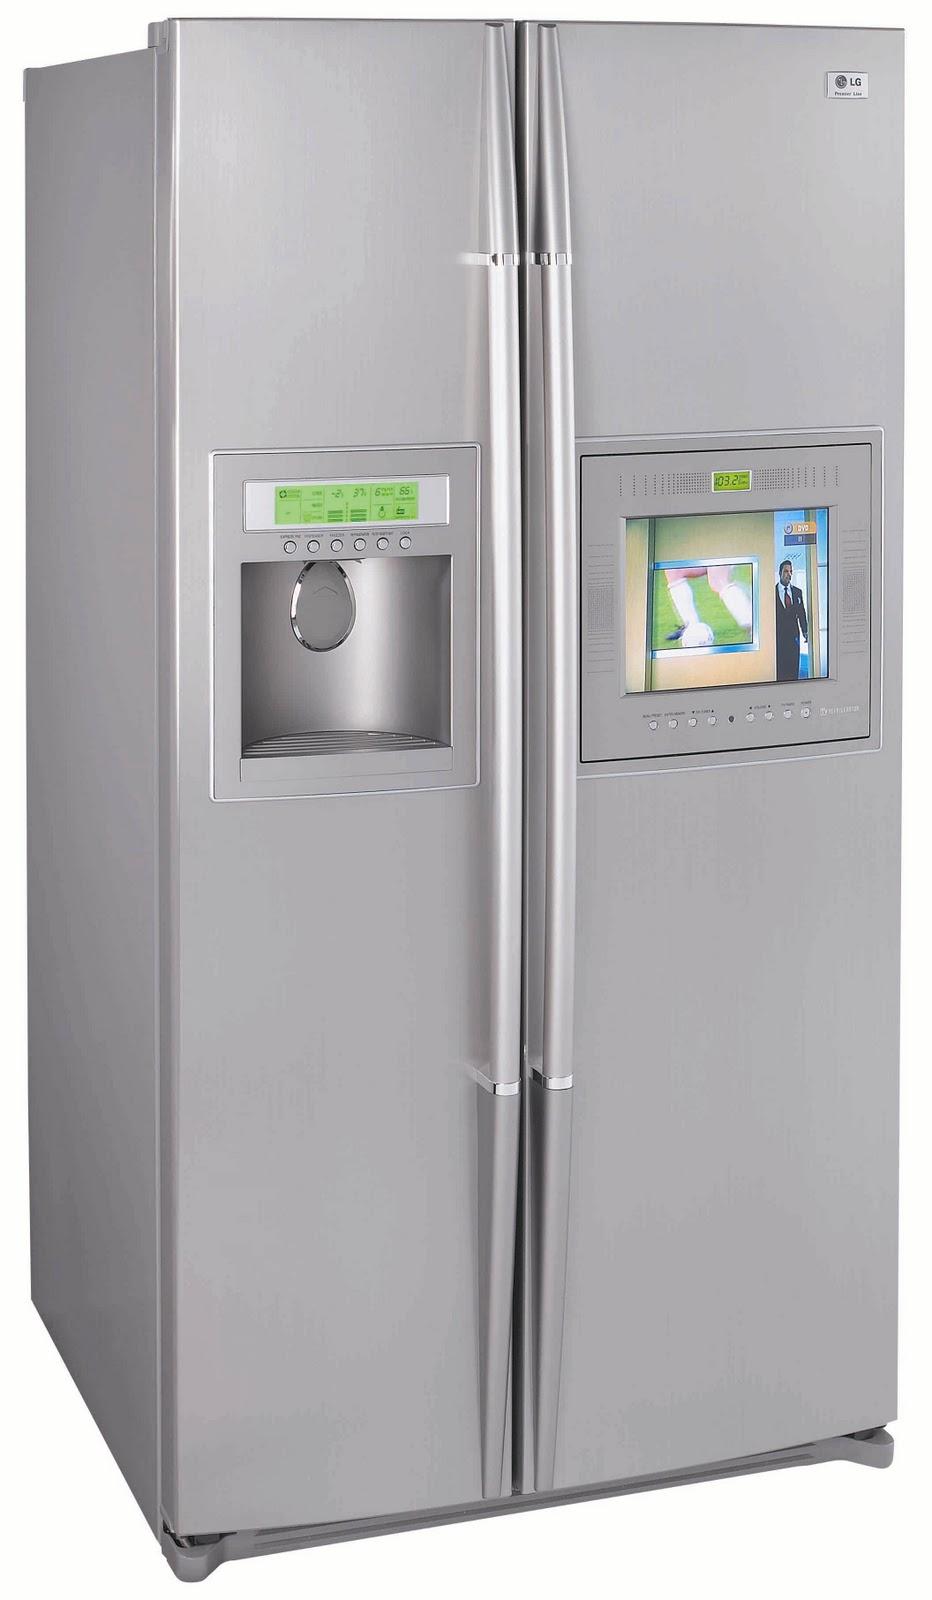 Household Appliance Refrigerator